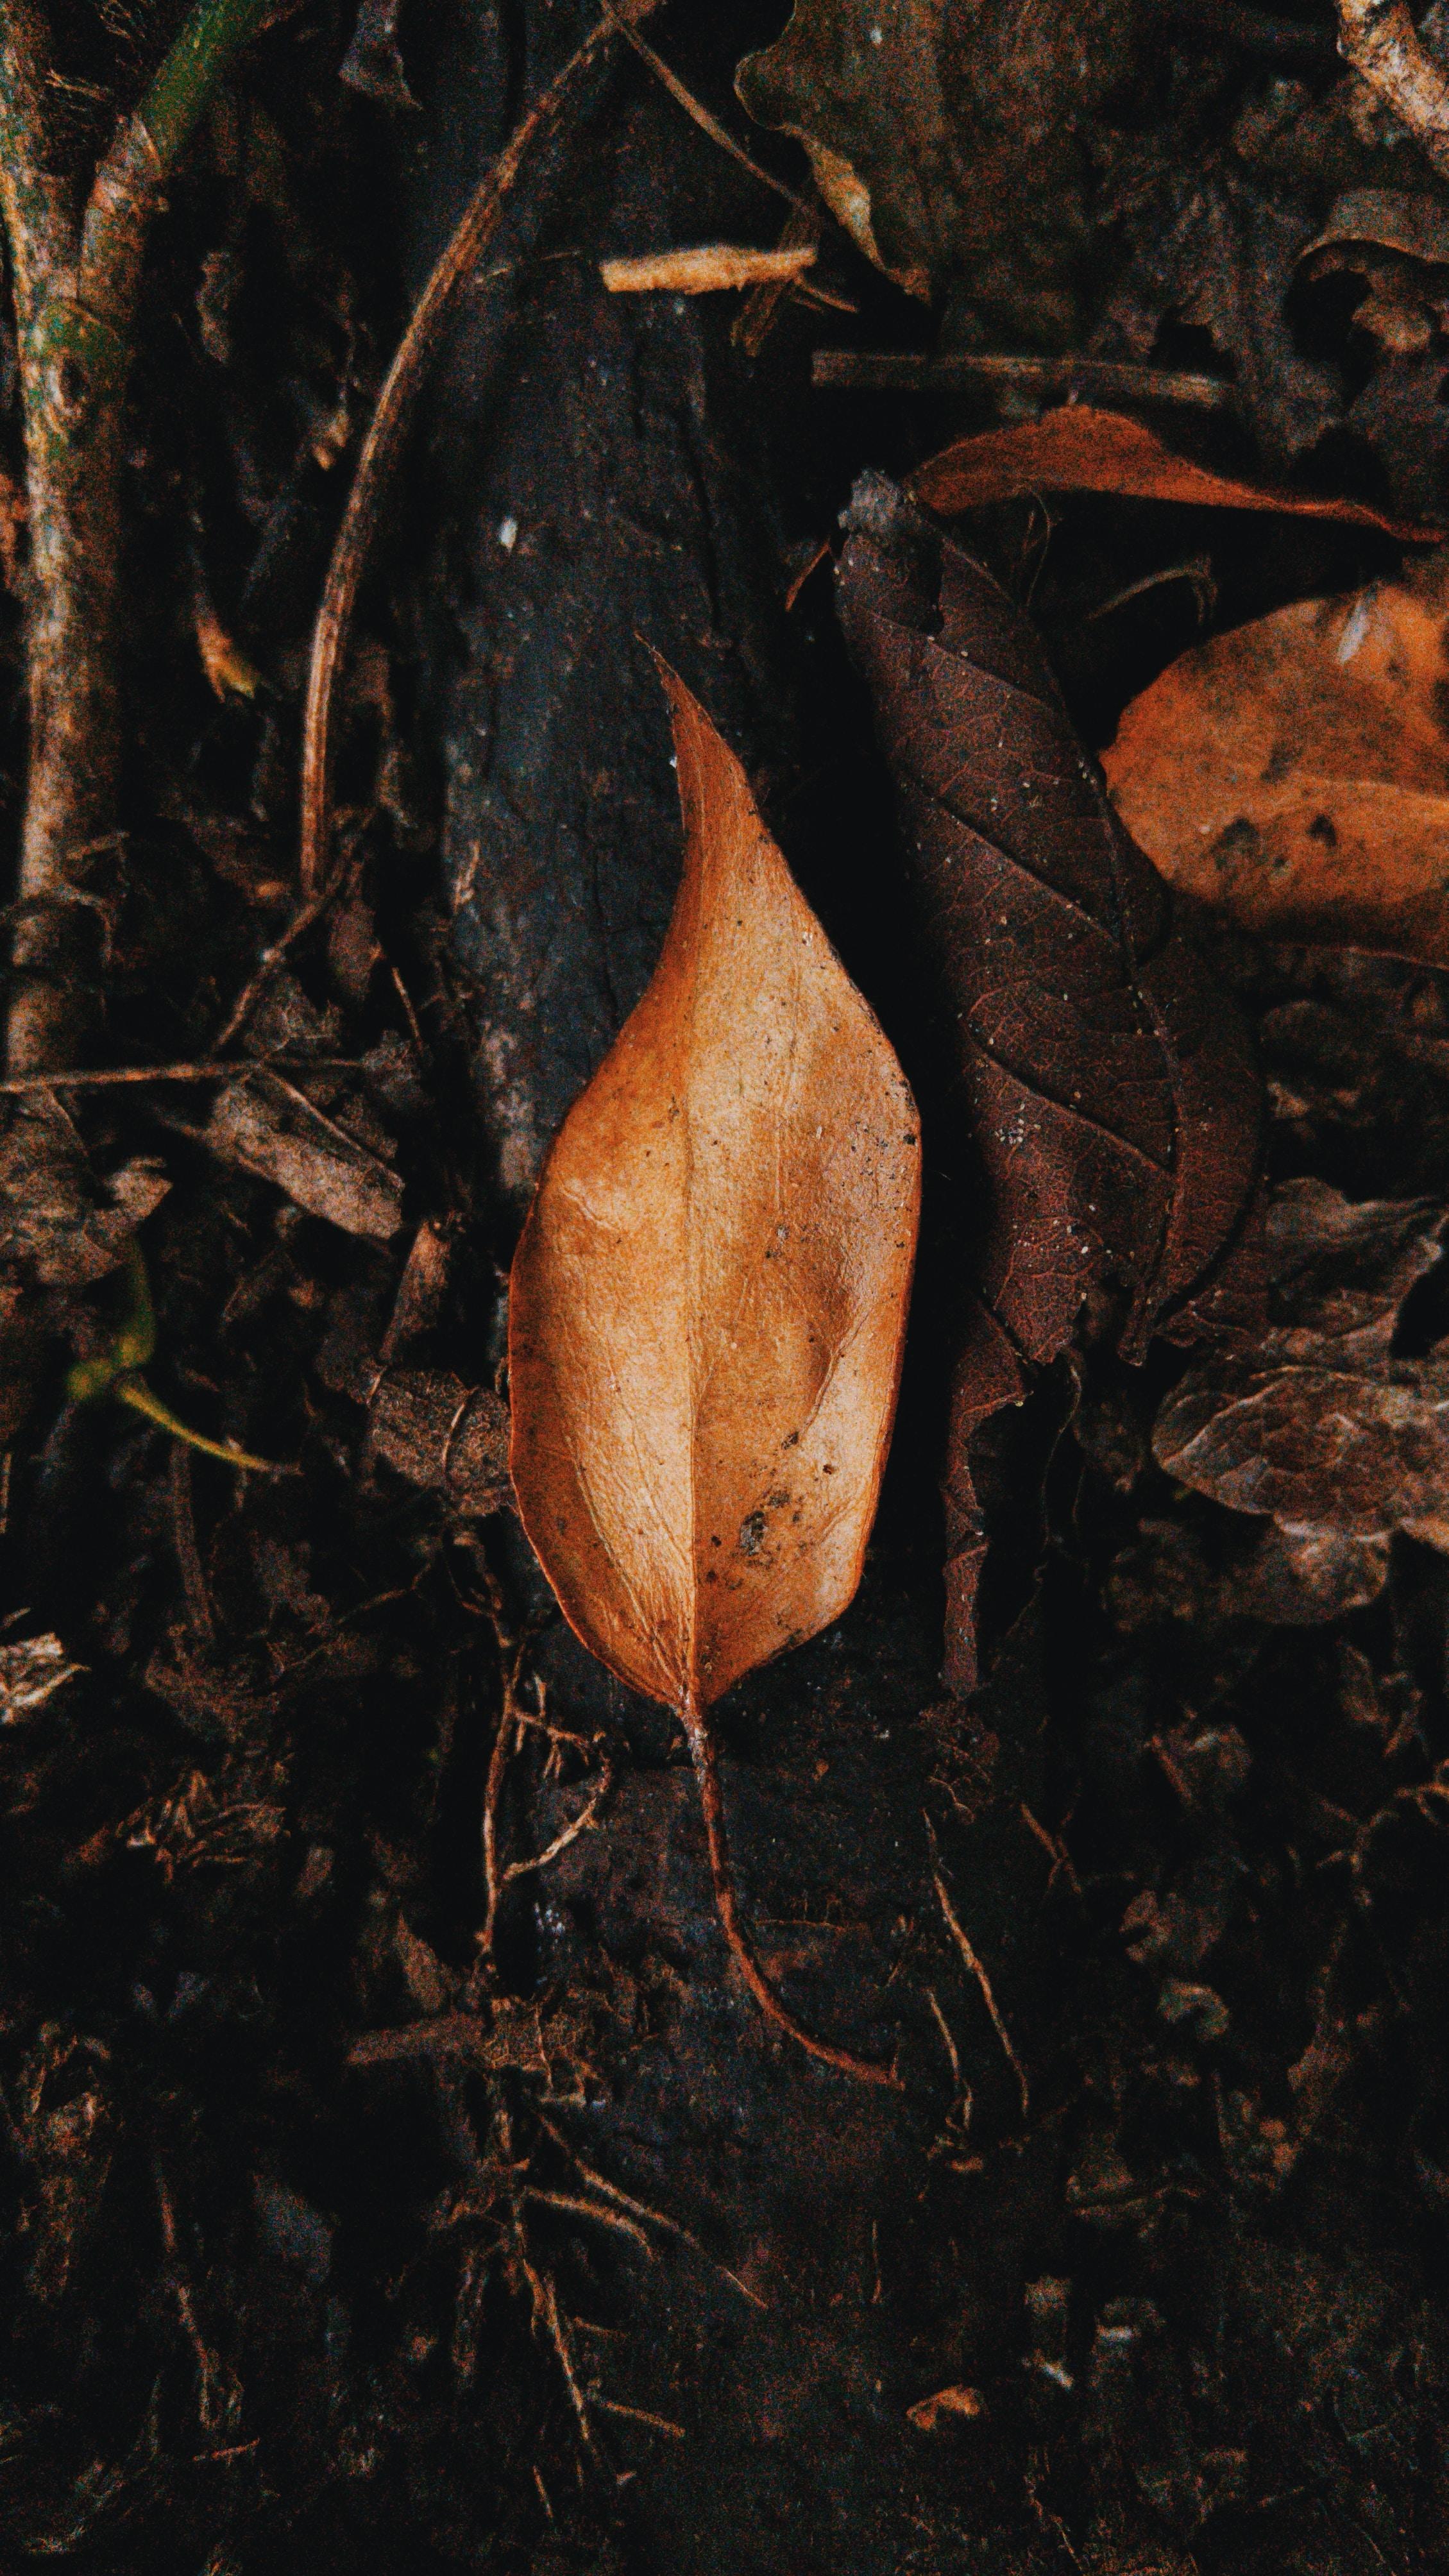 An orange leaf on the ground.